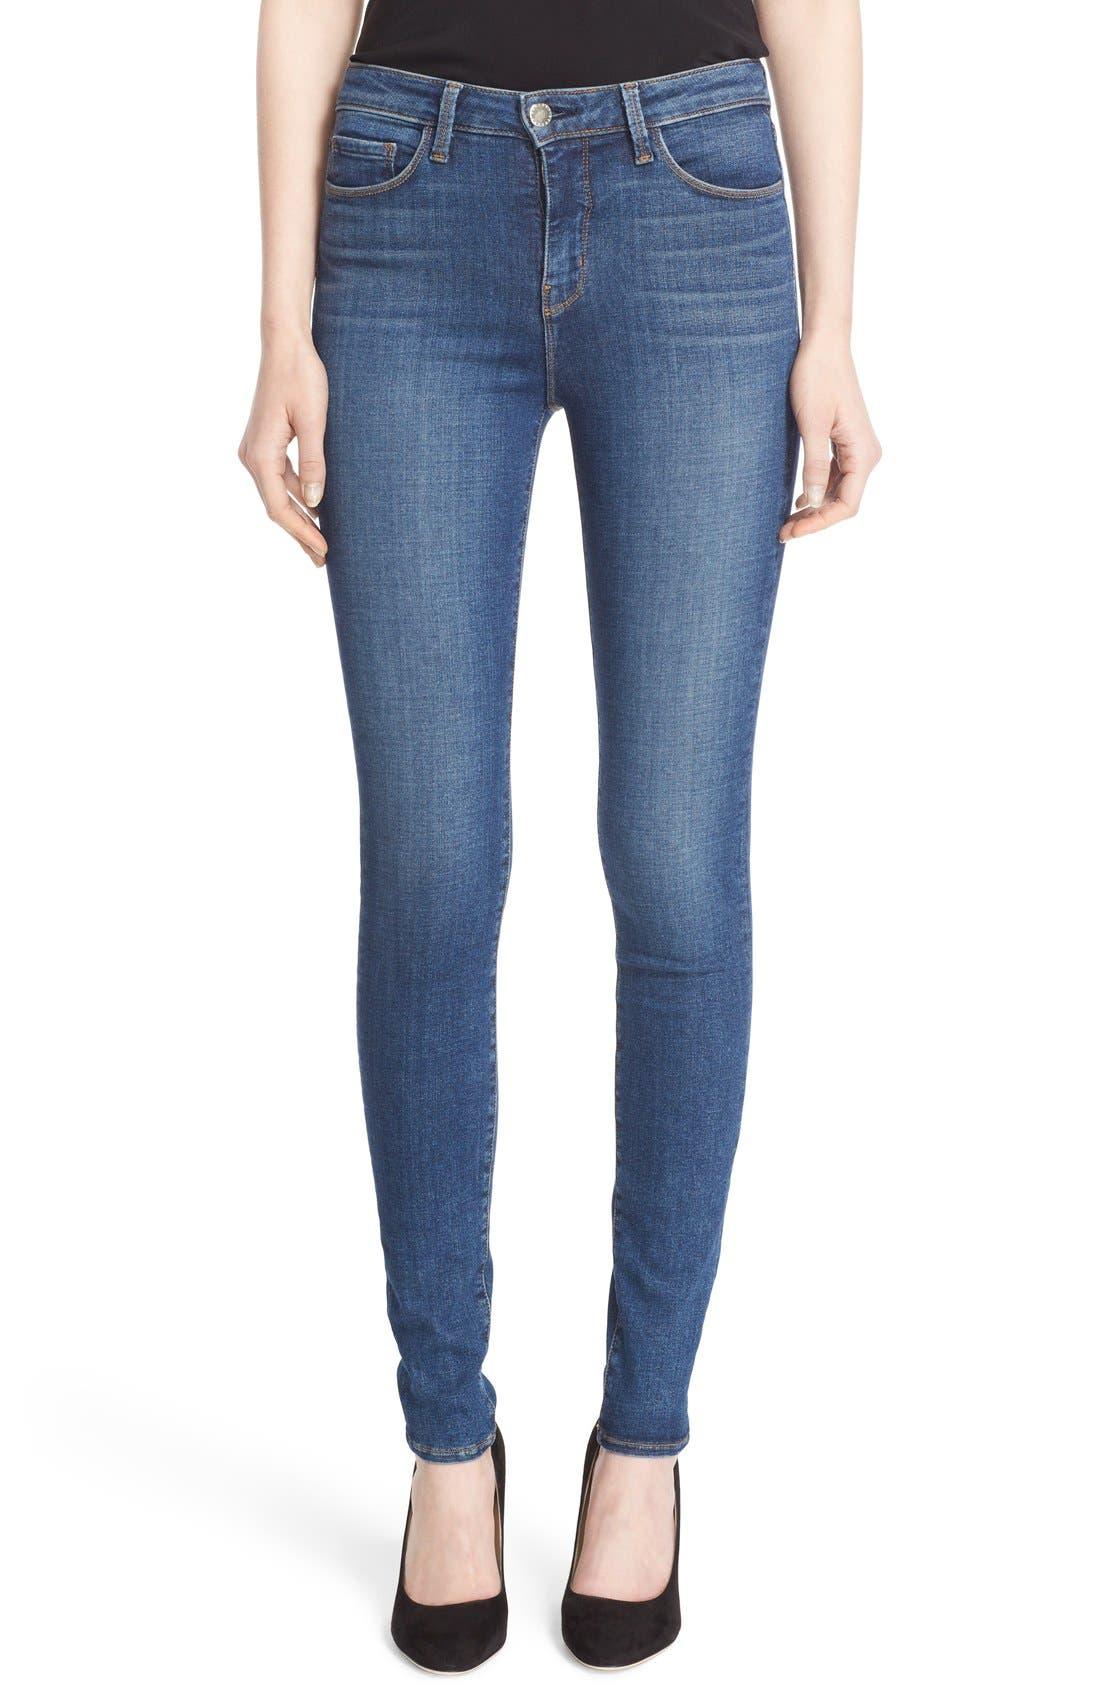 '30' High Rise Skinny Jeans,                             Main thumbnail 1, color,                             Dark Vintage